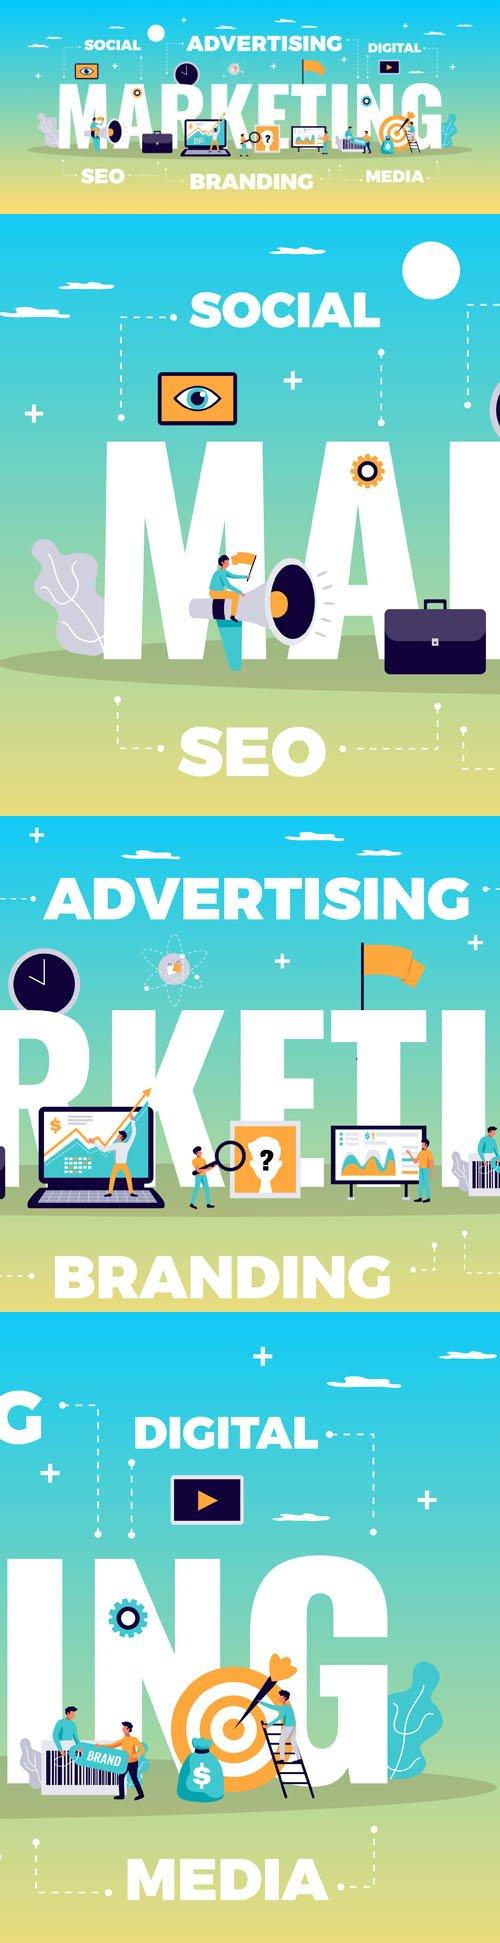 Digital Marketing Concept With Online Advertising Media Symbols Flat